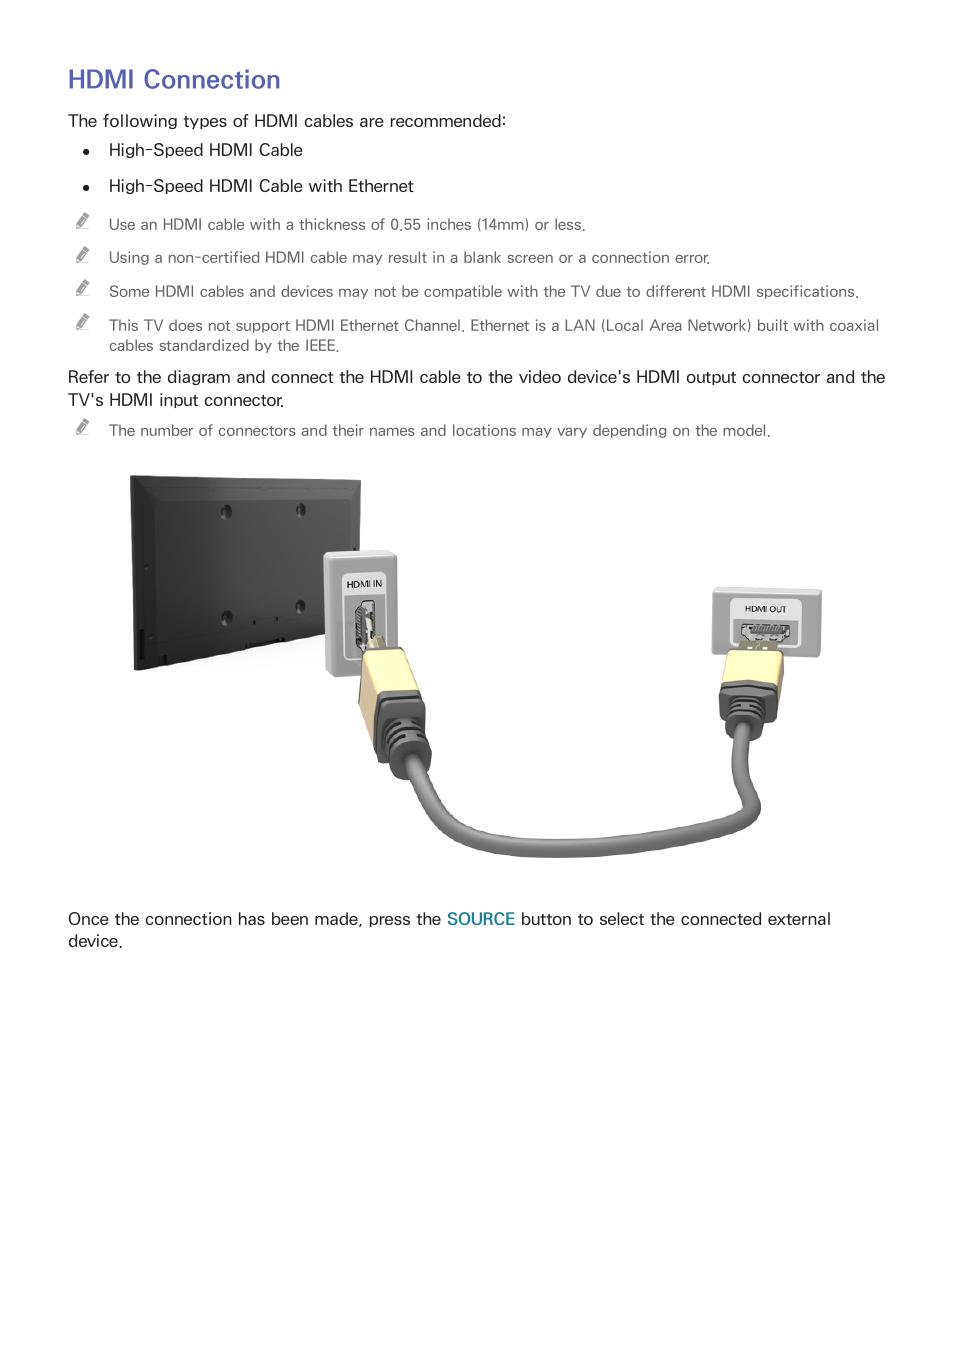 Repairing An Hdmi Cable Manual Guide